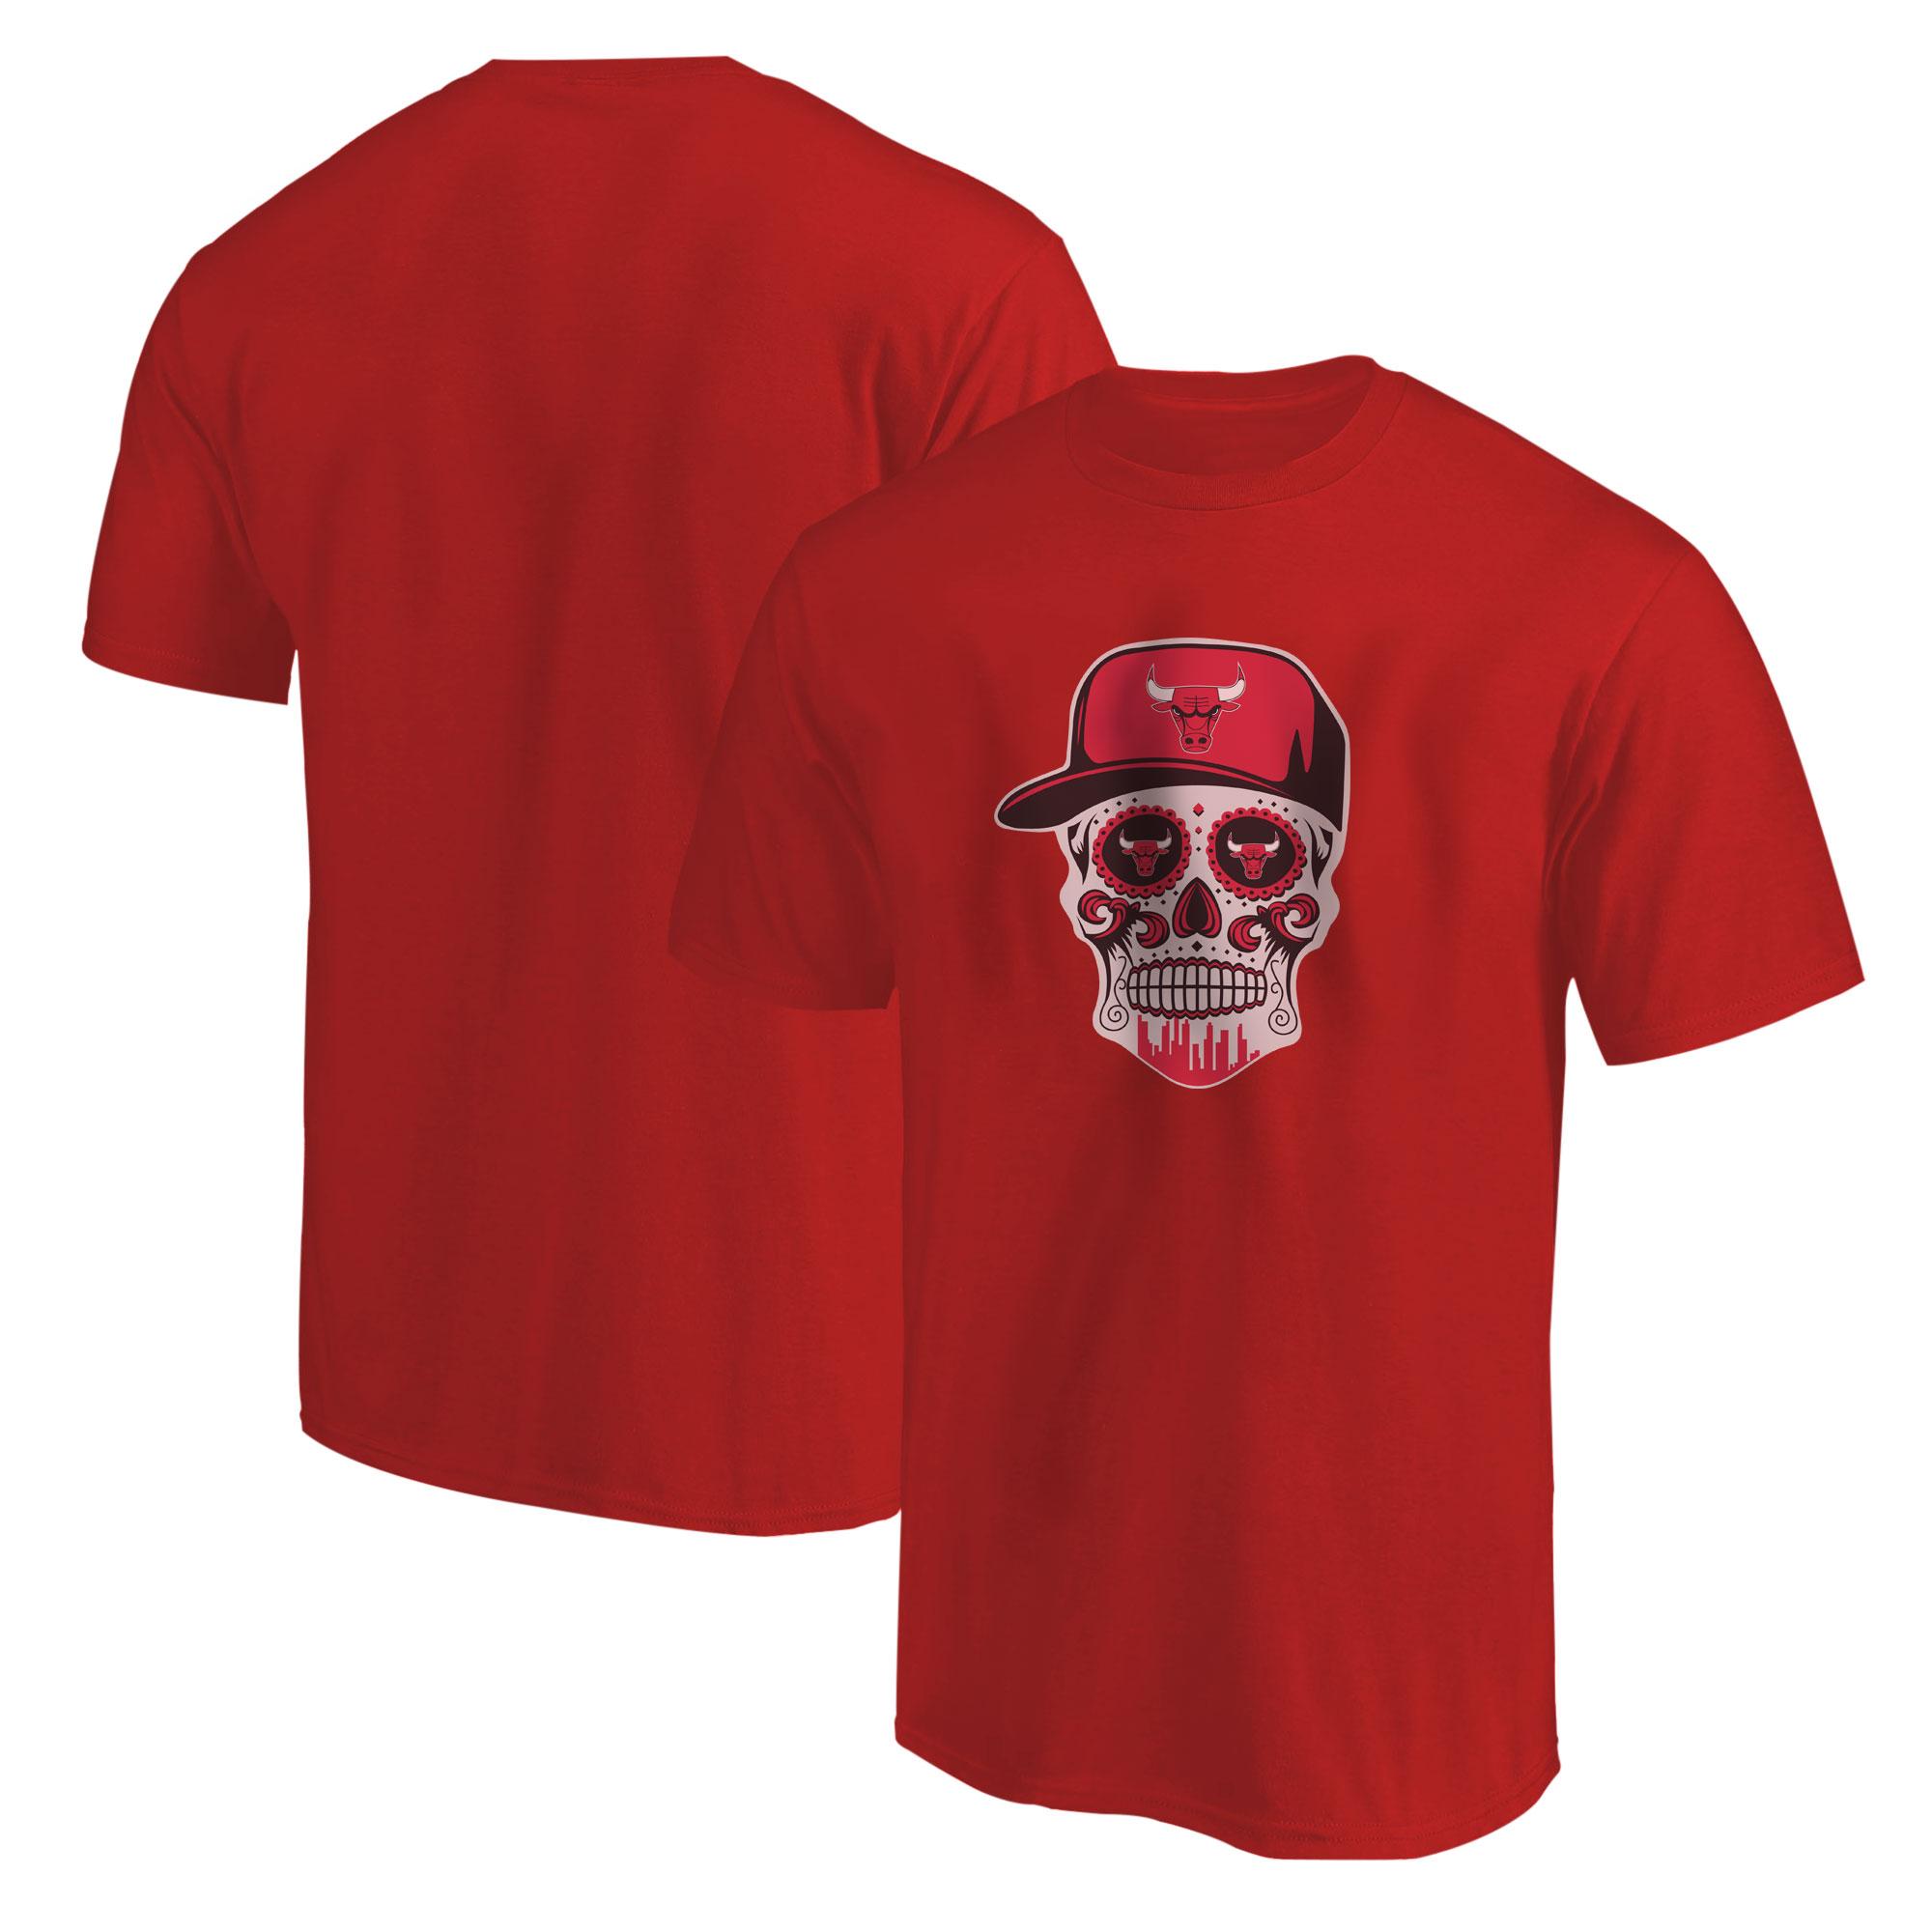 Bulls Skull Tshirt (TSH-RED-NP-447-BULLS-SKULL)